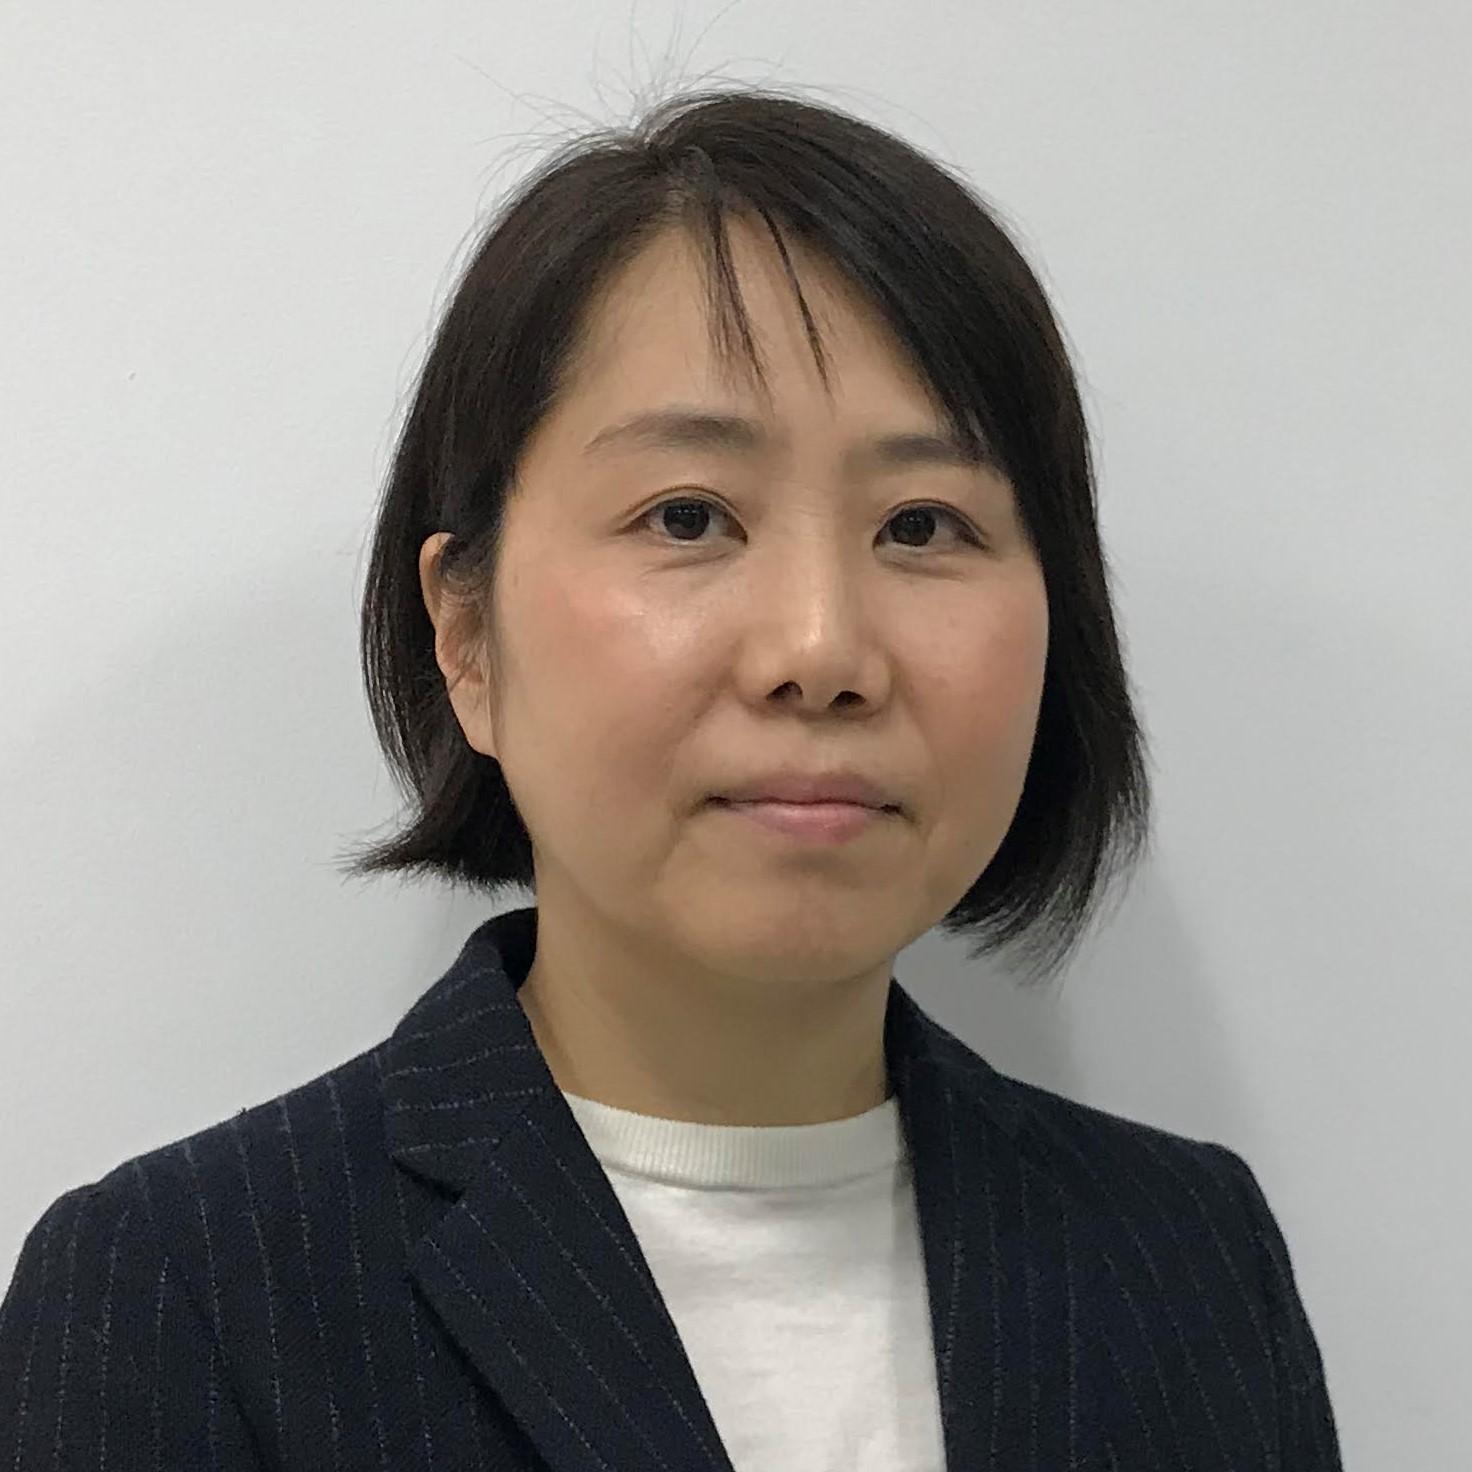 Takako Matsubayashi